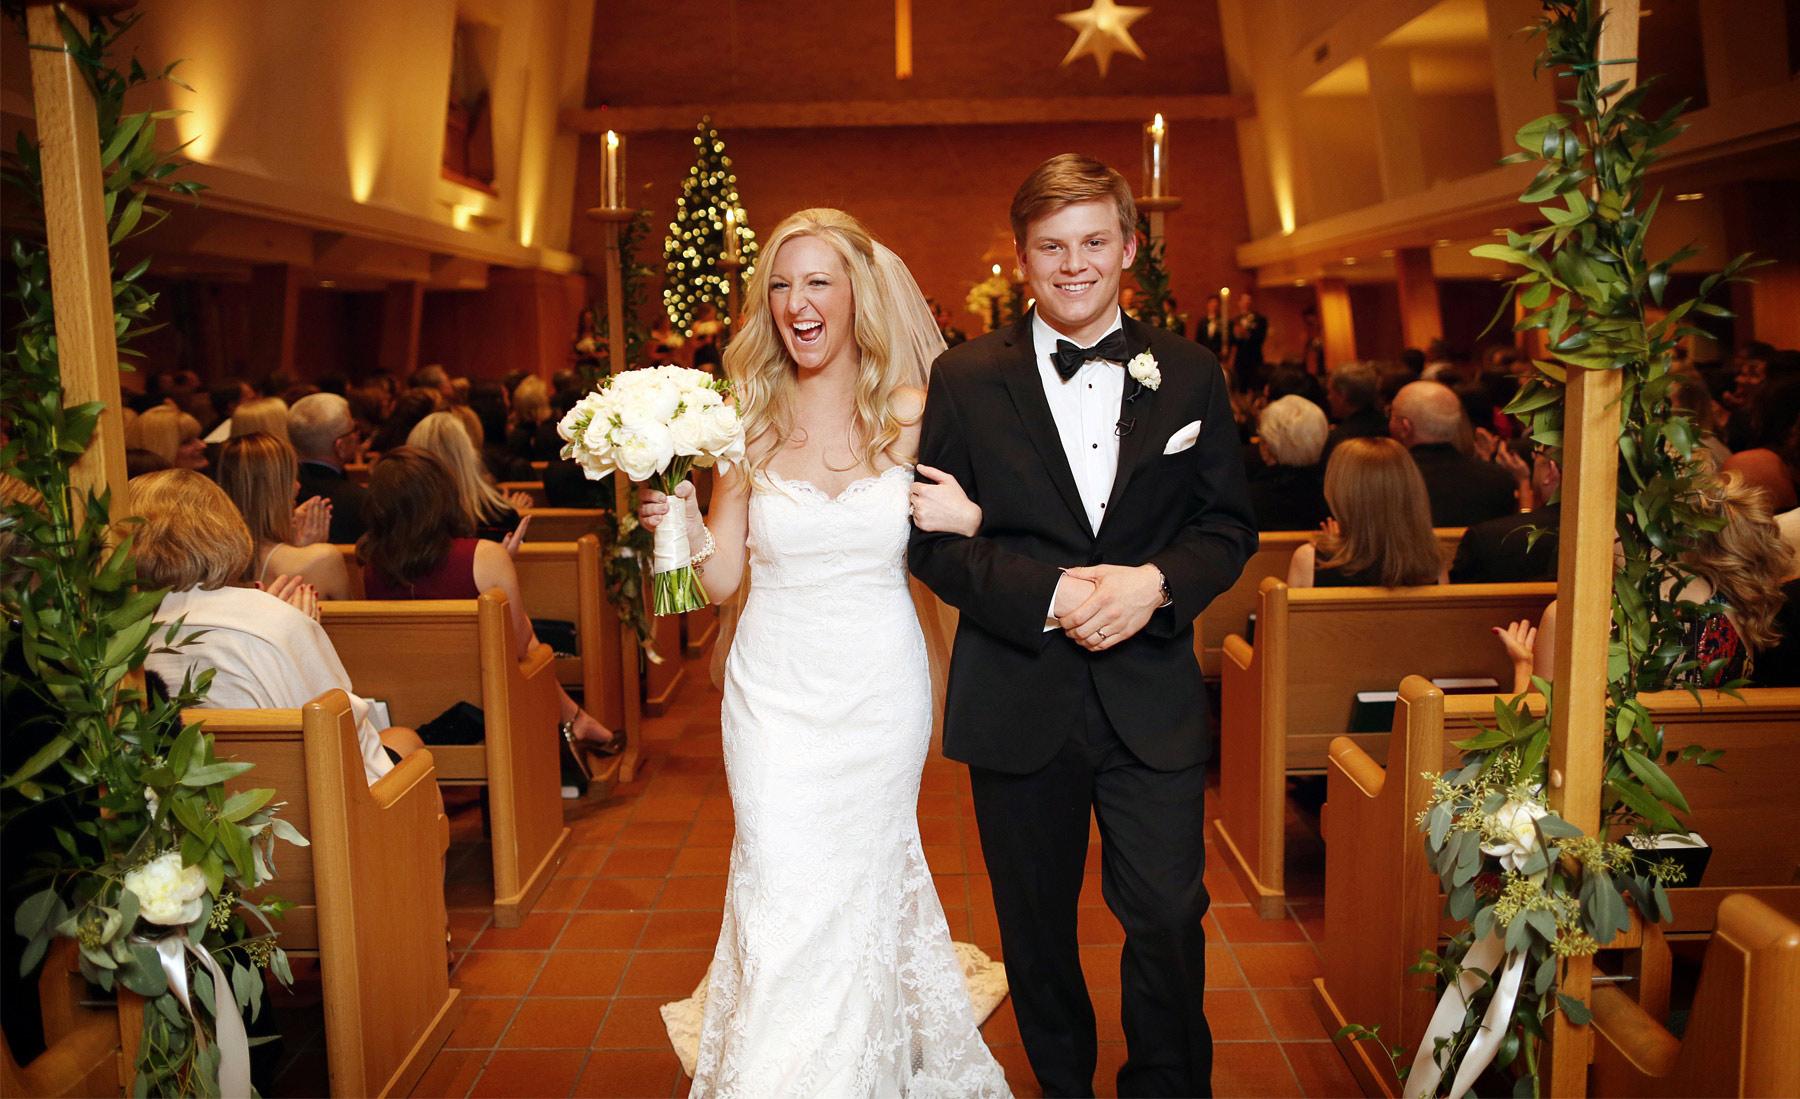 14-Minneapolis-Minnesota-Wedding-Photography-by-Vick-Photography-Ceremony--Normandale-Lutheran-Church-Caroline-and-J.jpg